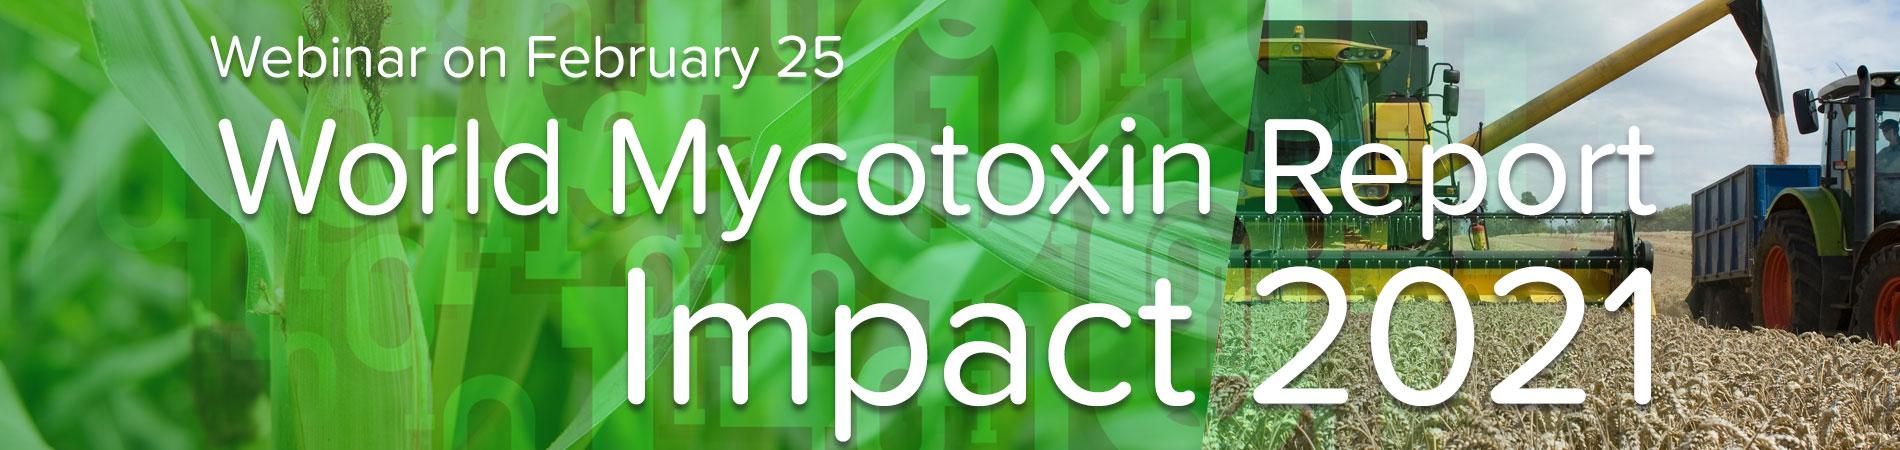 MTX-Survey-Webinar-Impact-2021-header-1